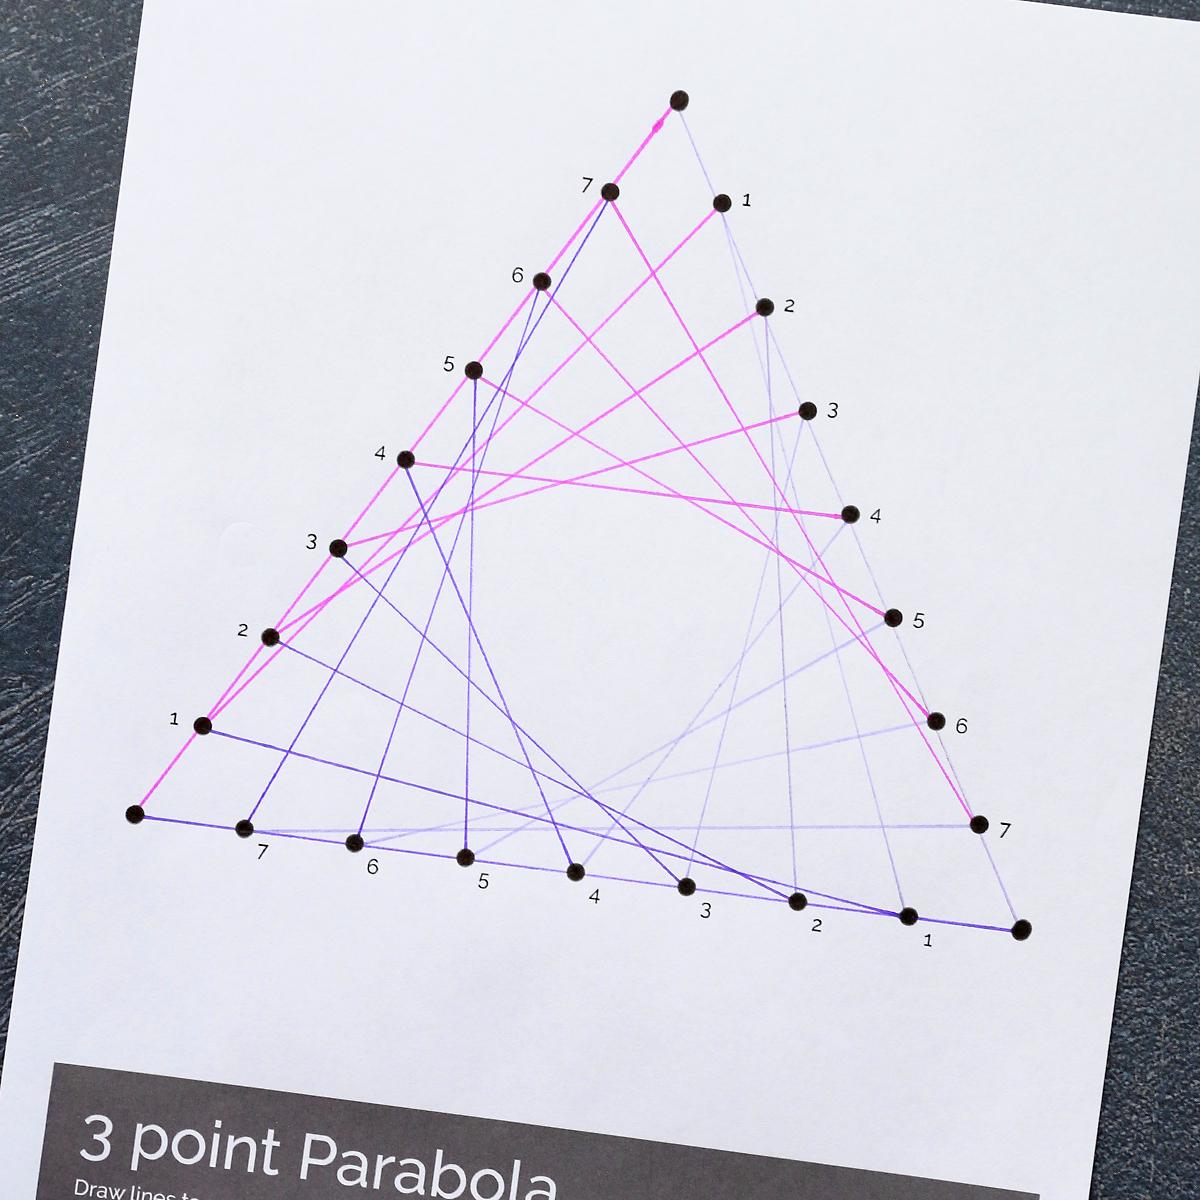 Parabola line art